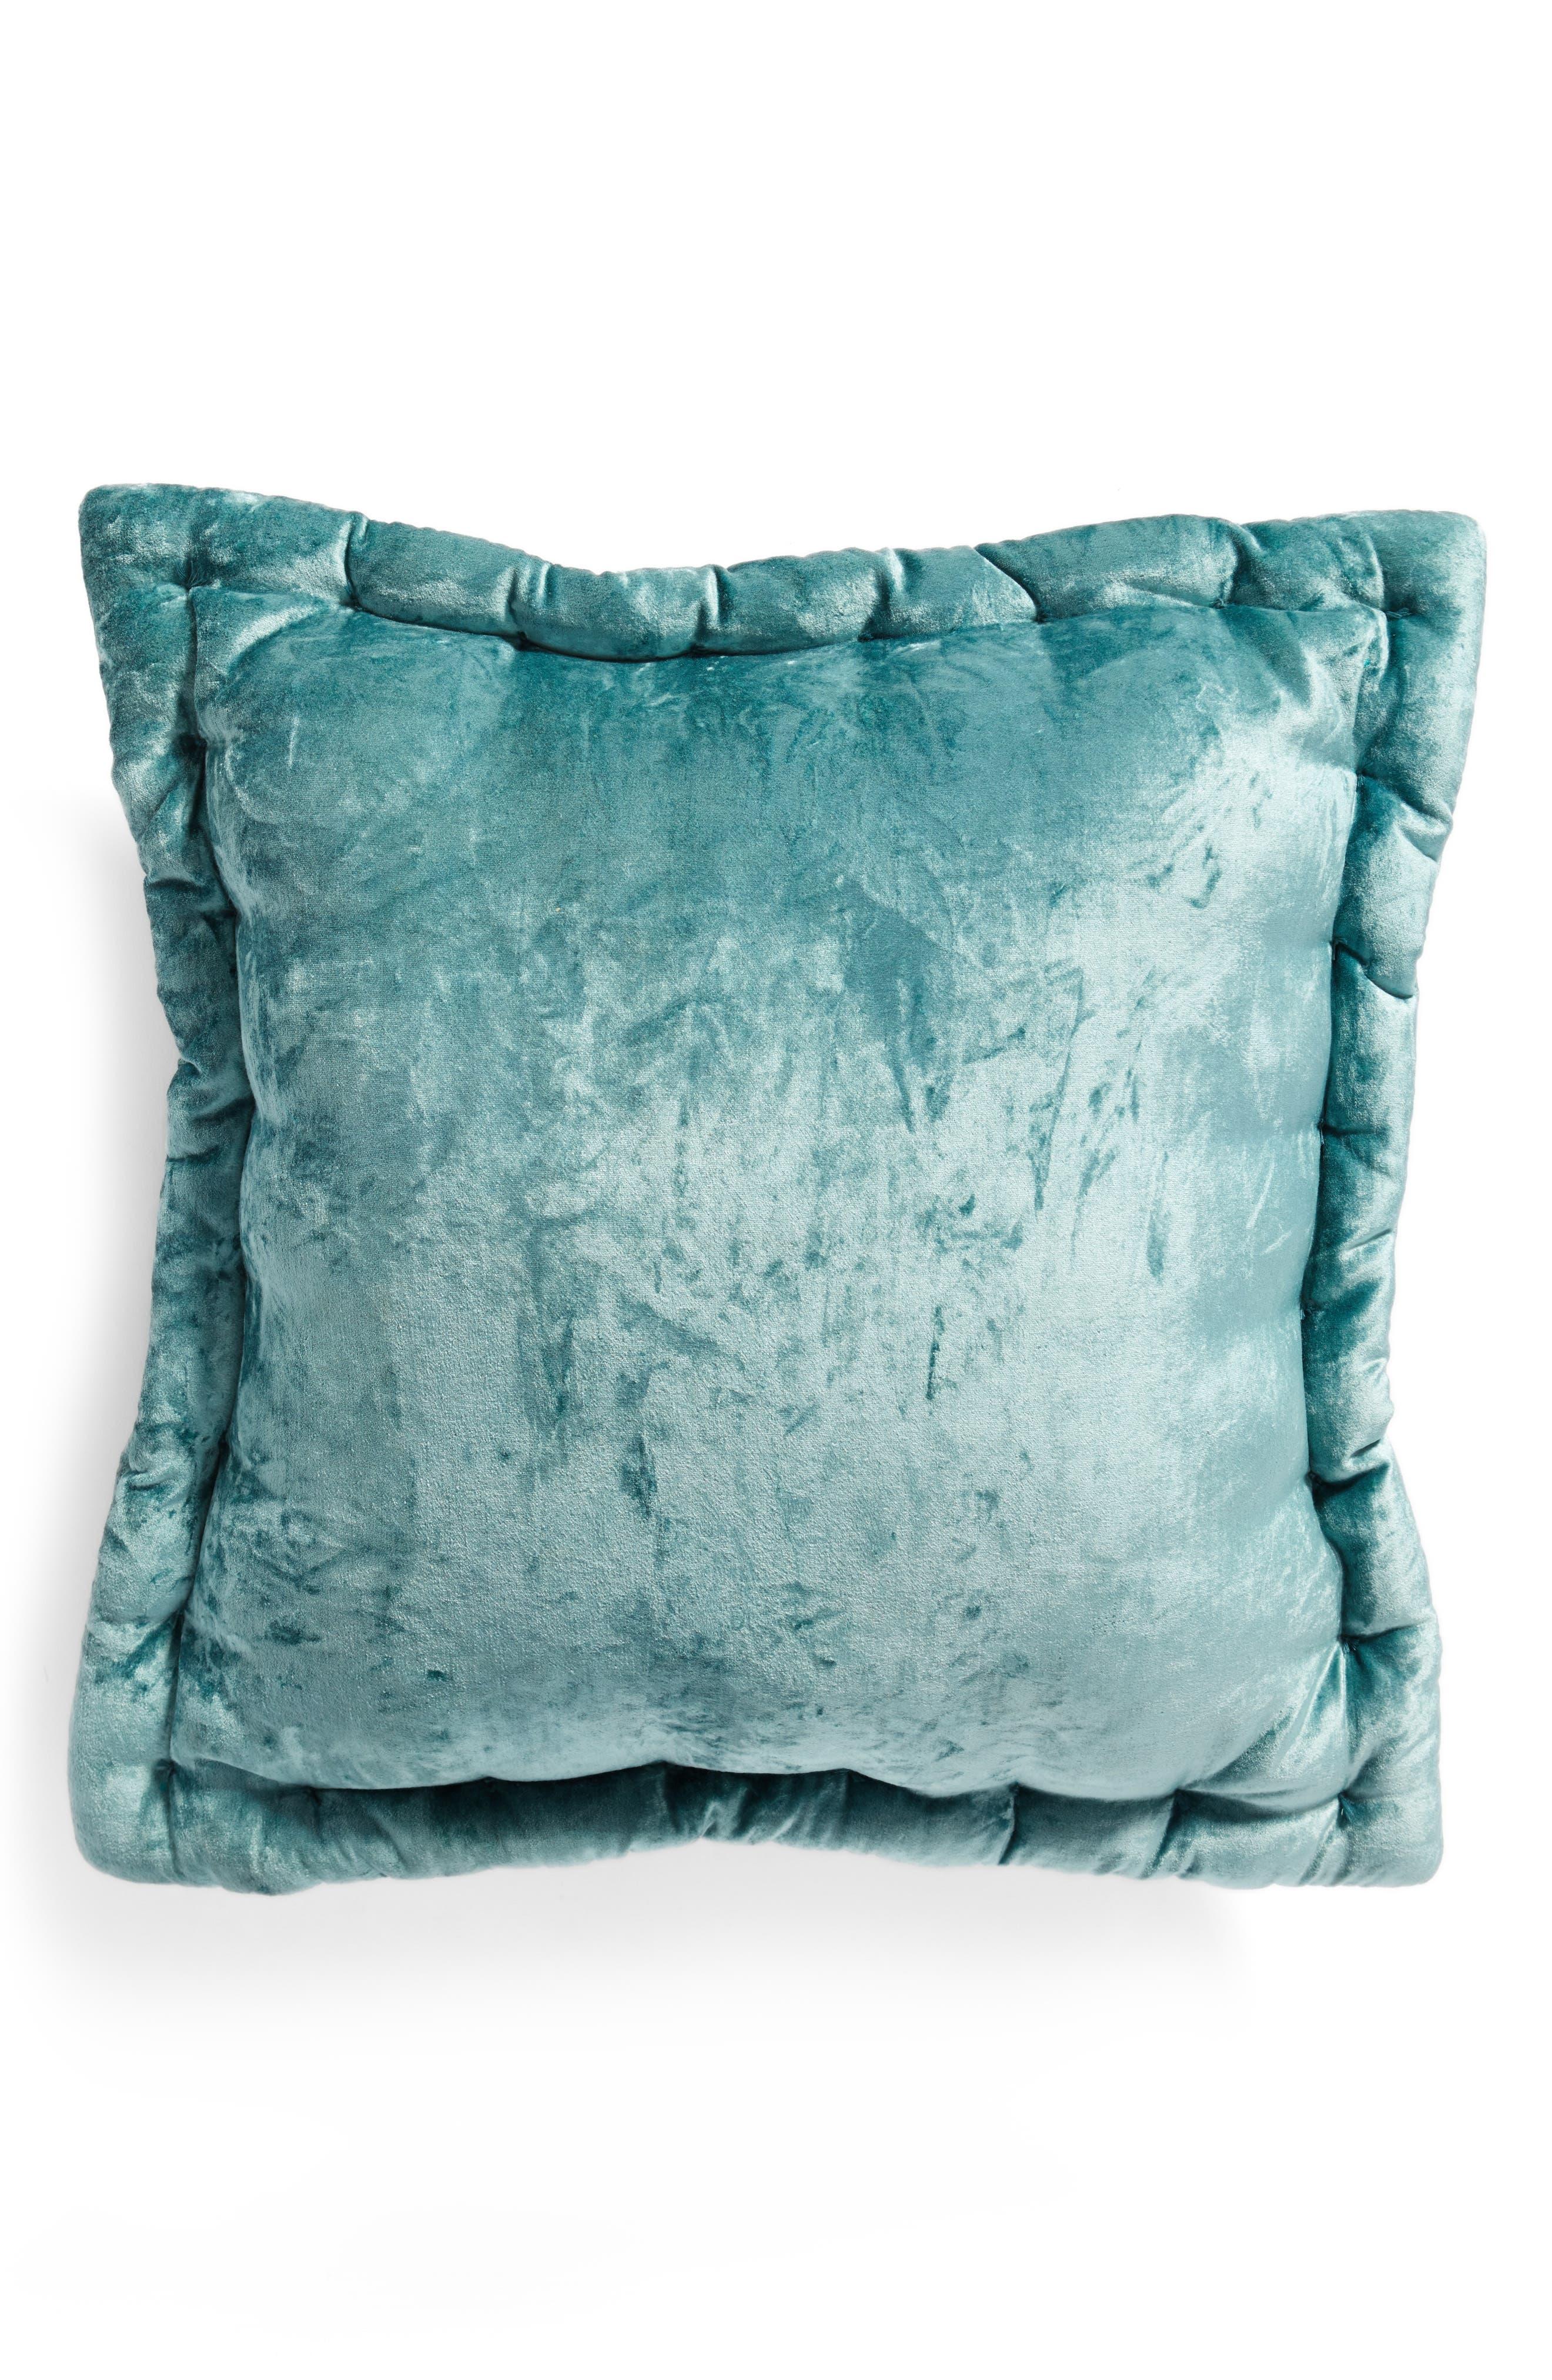 Velvet Accent Pillow,                             Main thumbnail 1, color,                             Teal Titanic